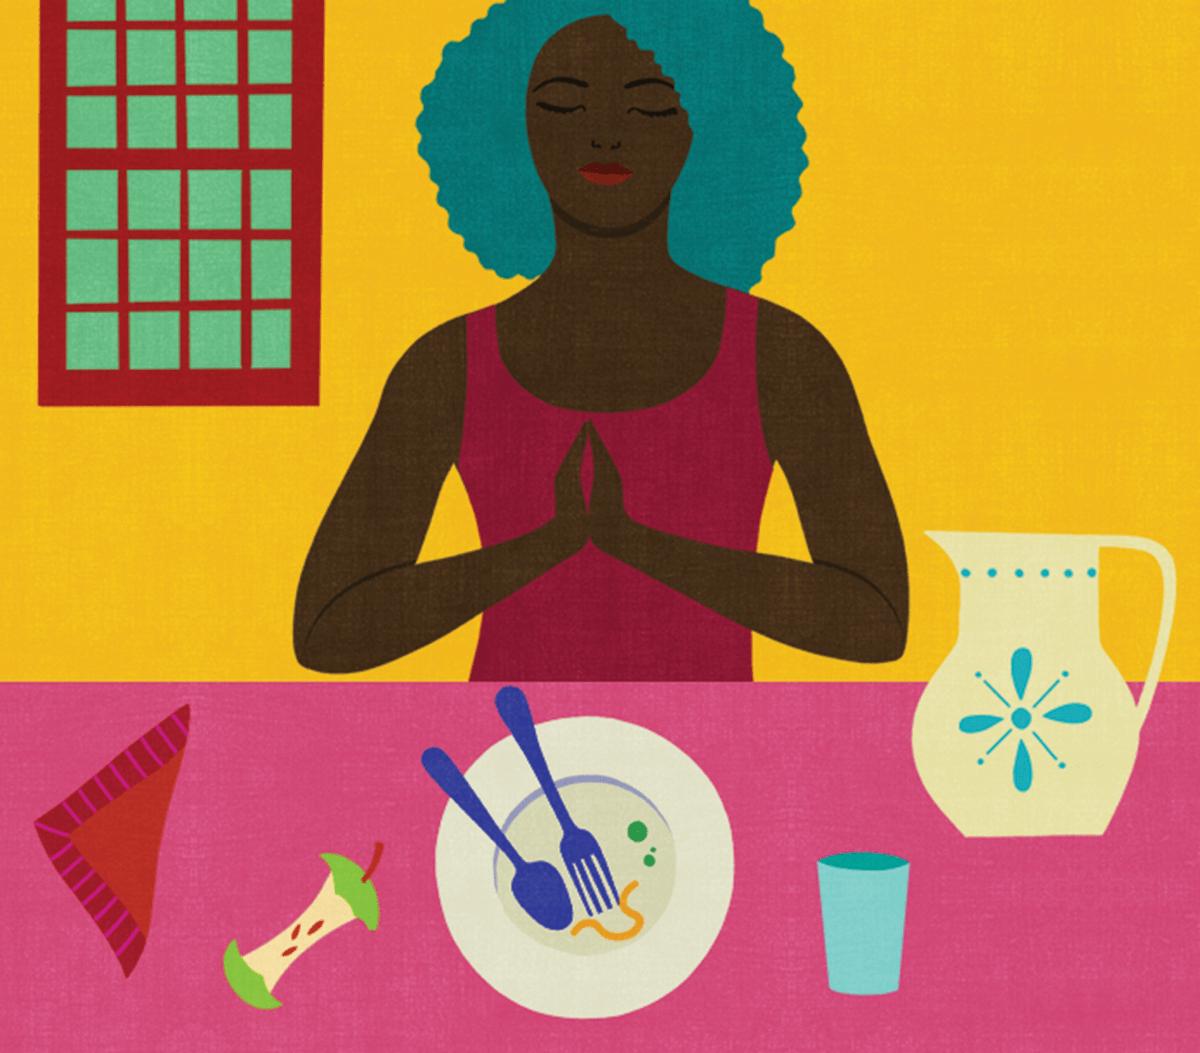 Illustration of woman meditating after meal